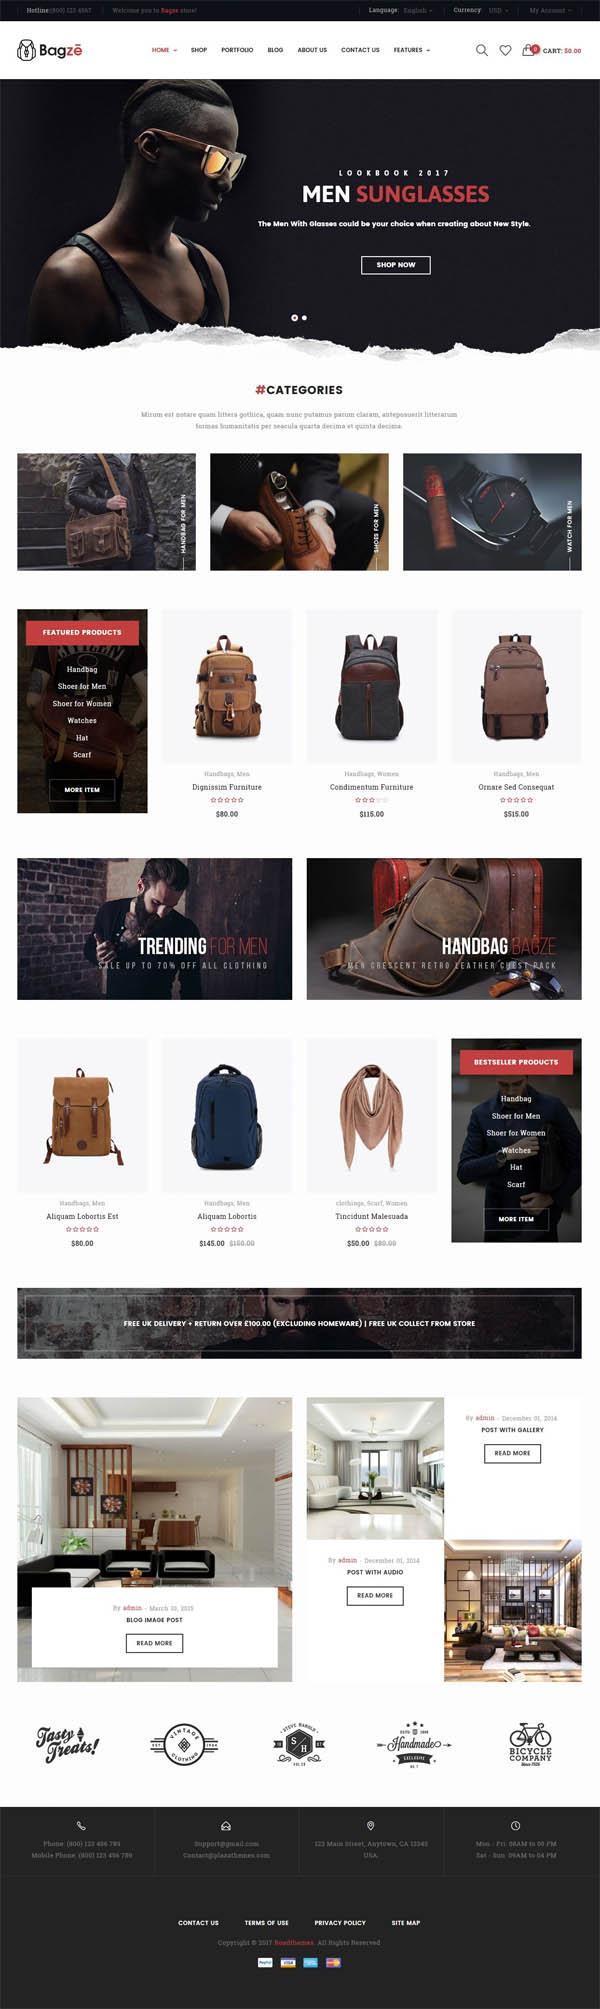 Bagze – Bag Shop WooCommerce WordPress Theme